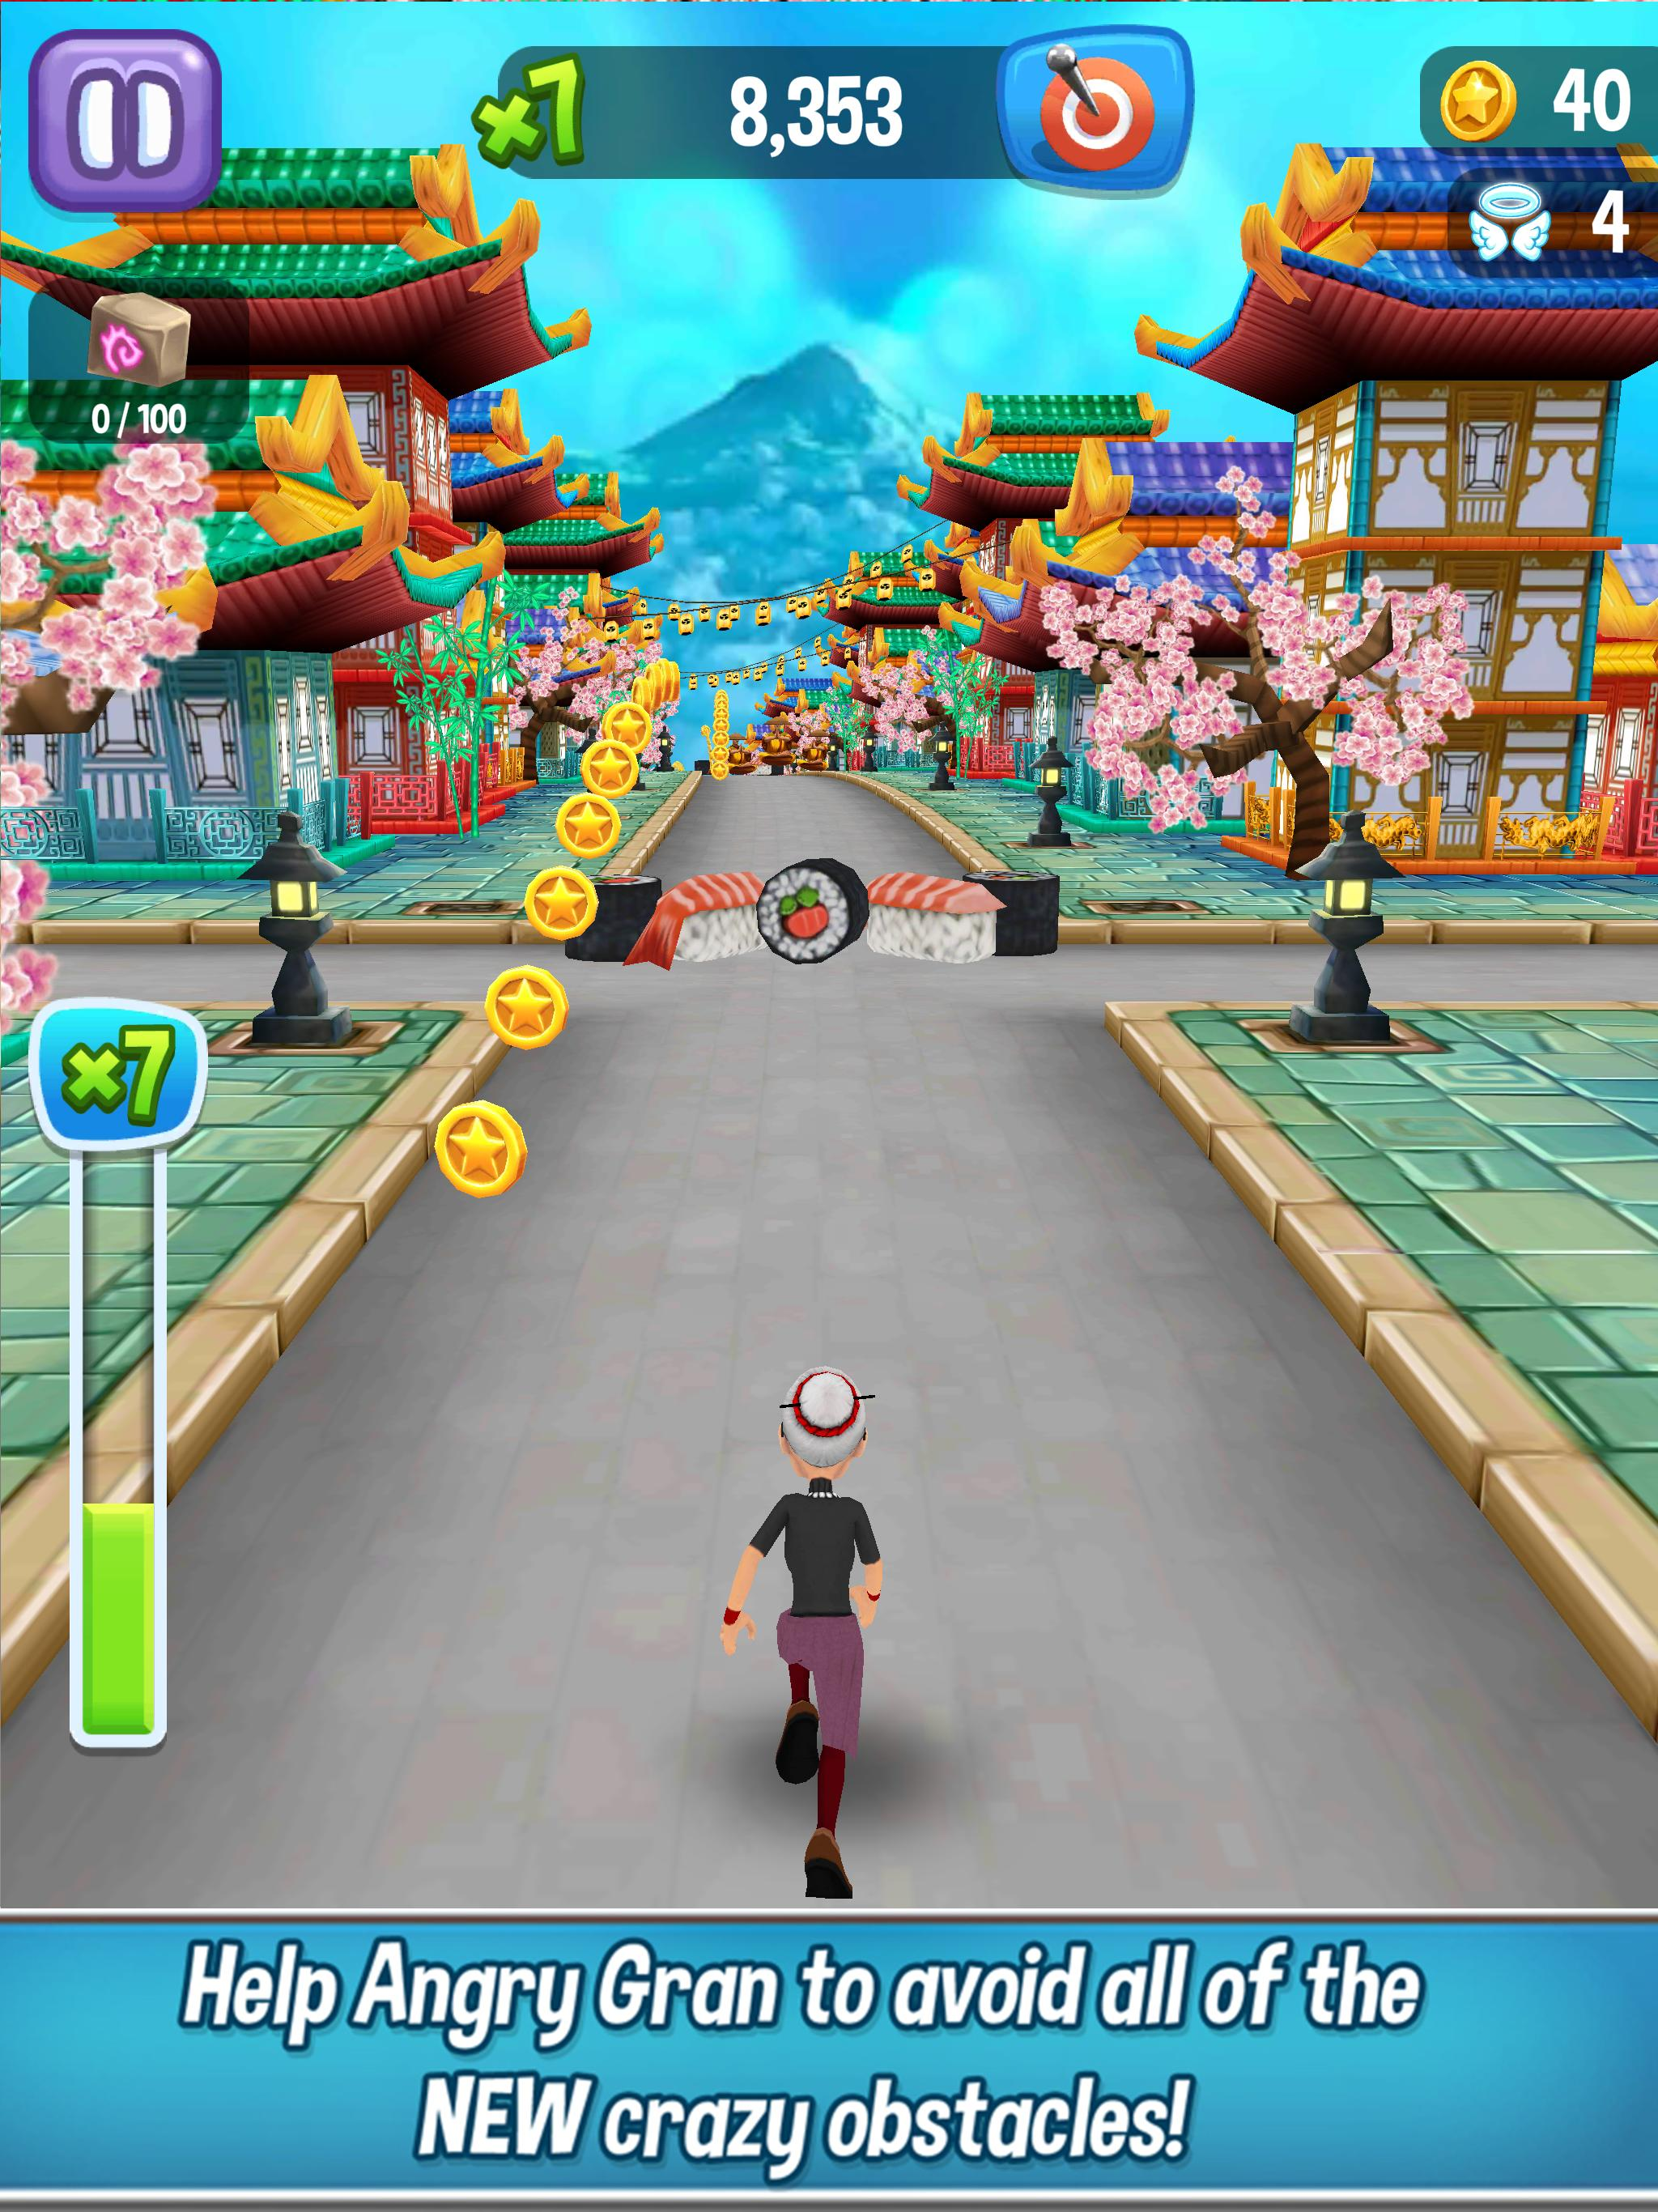 Angry Gran Run Running Game 2.12.1 Screenshot 15